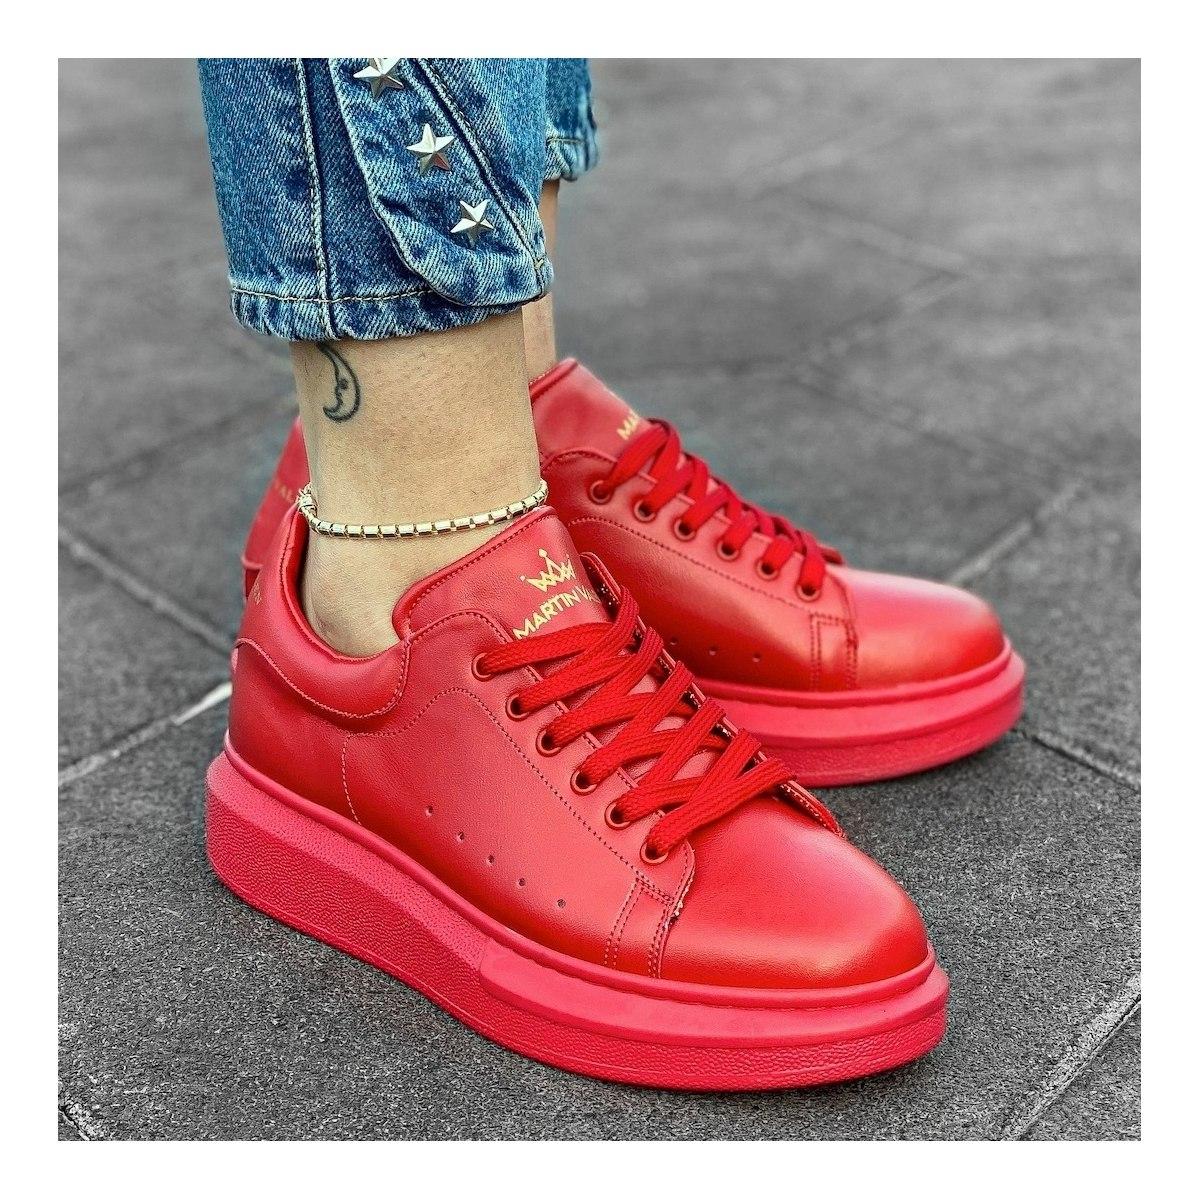 Woman's Hype Sole Sneakers...